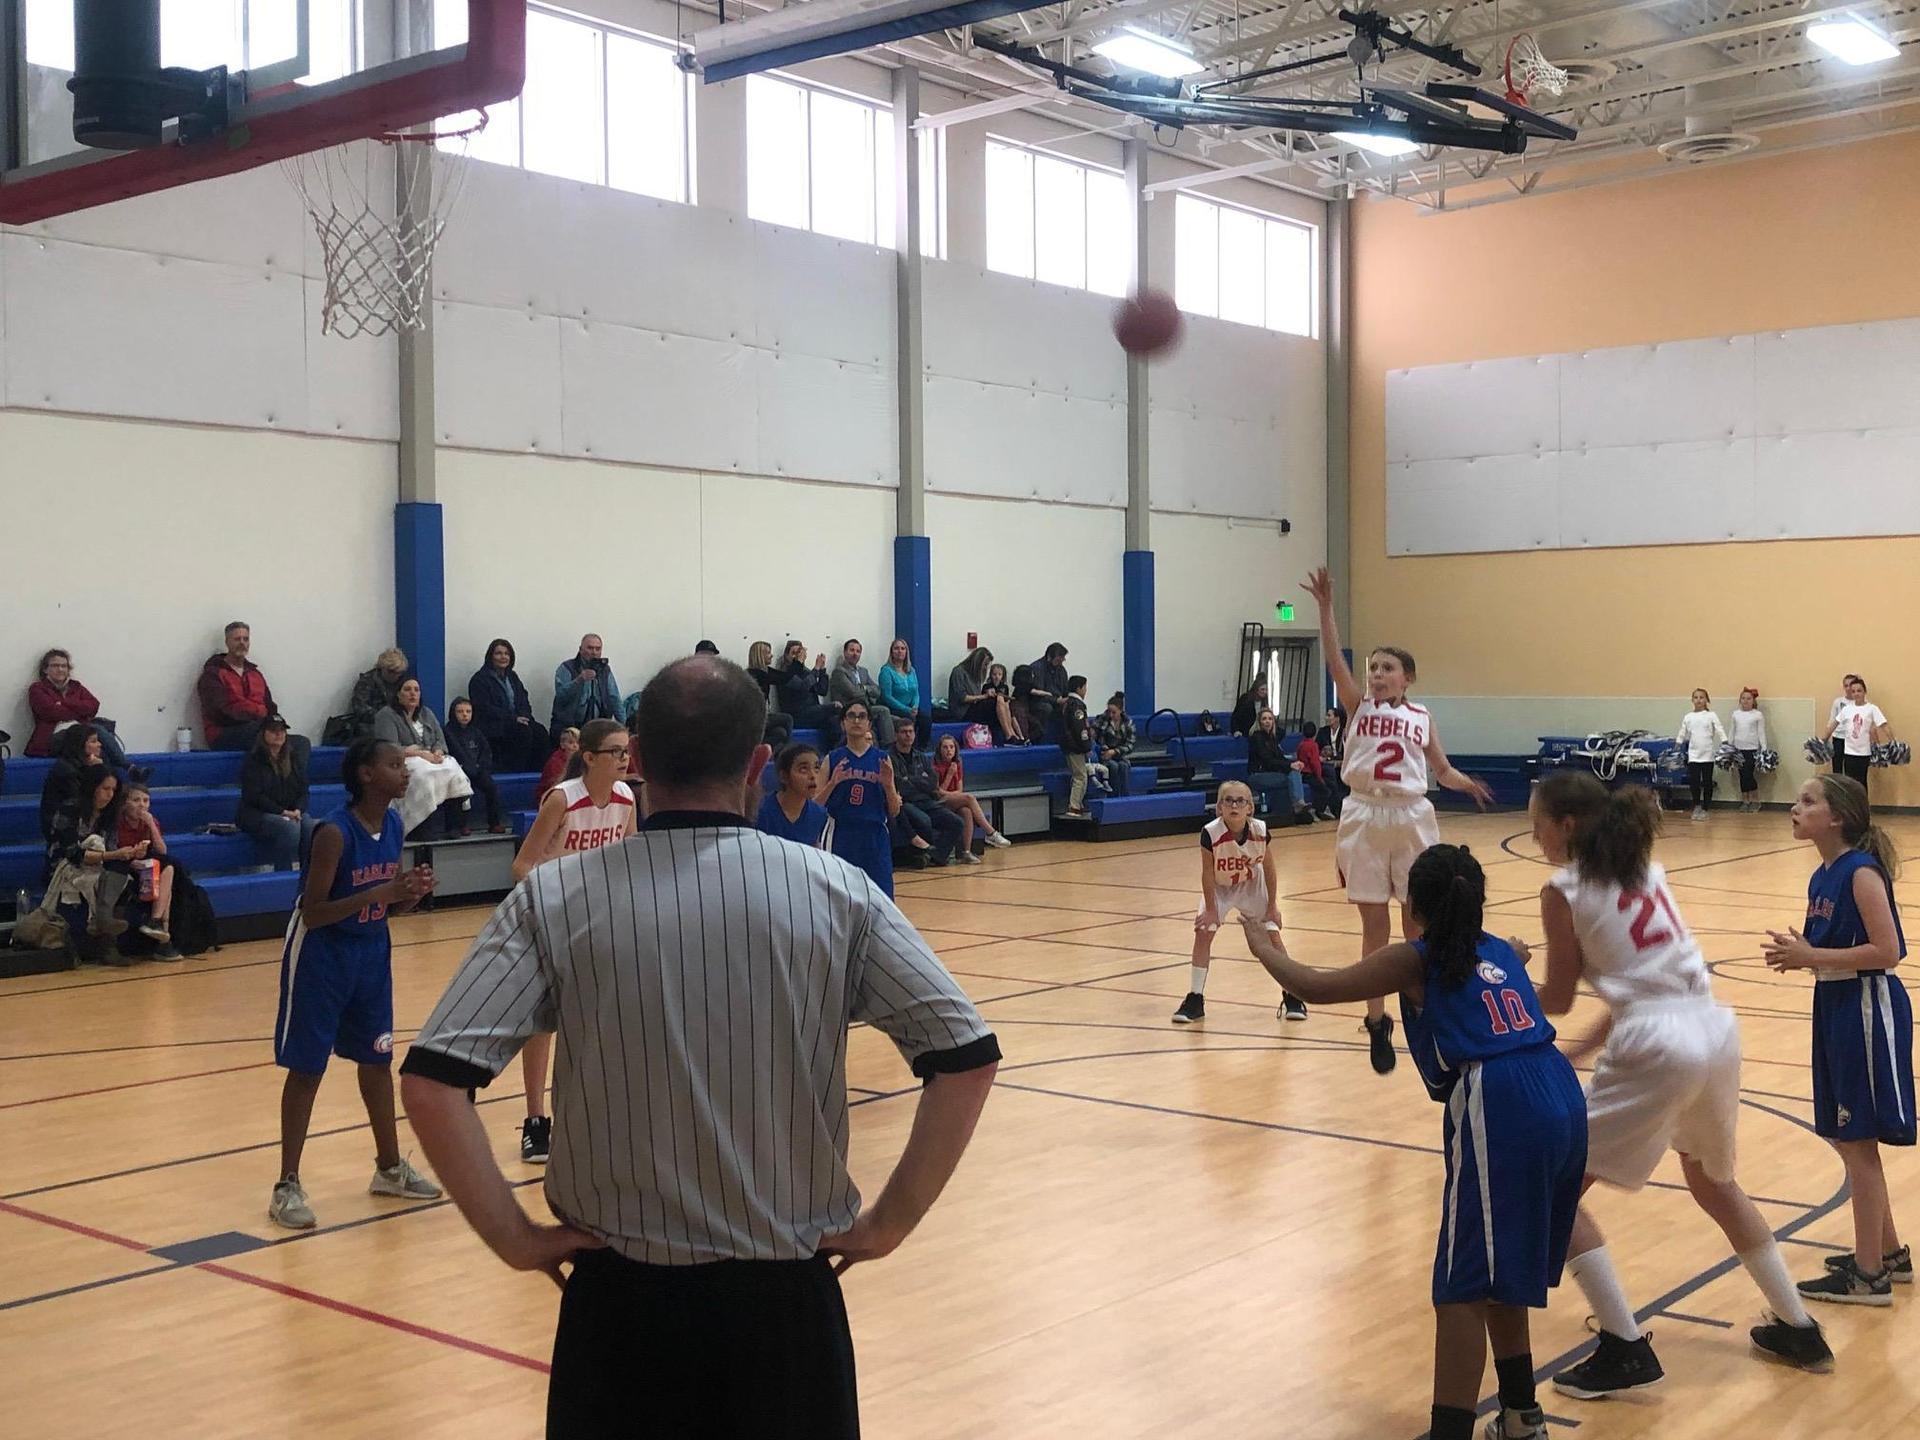 Girls Basketball jump shot